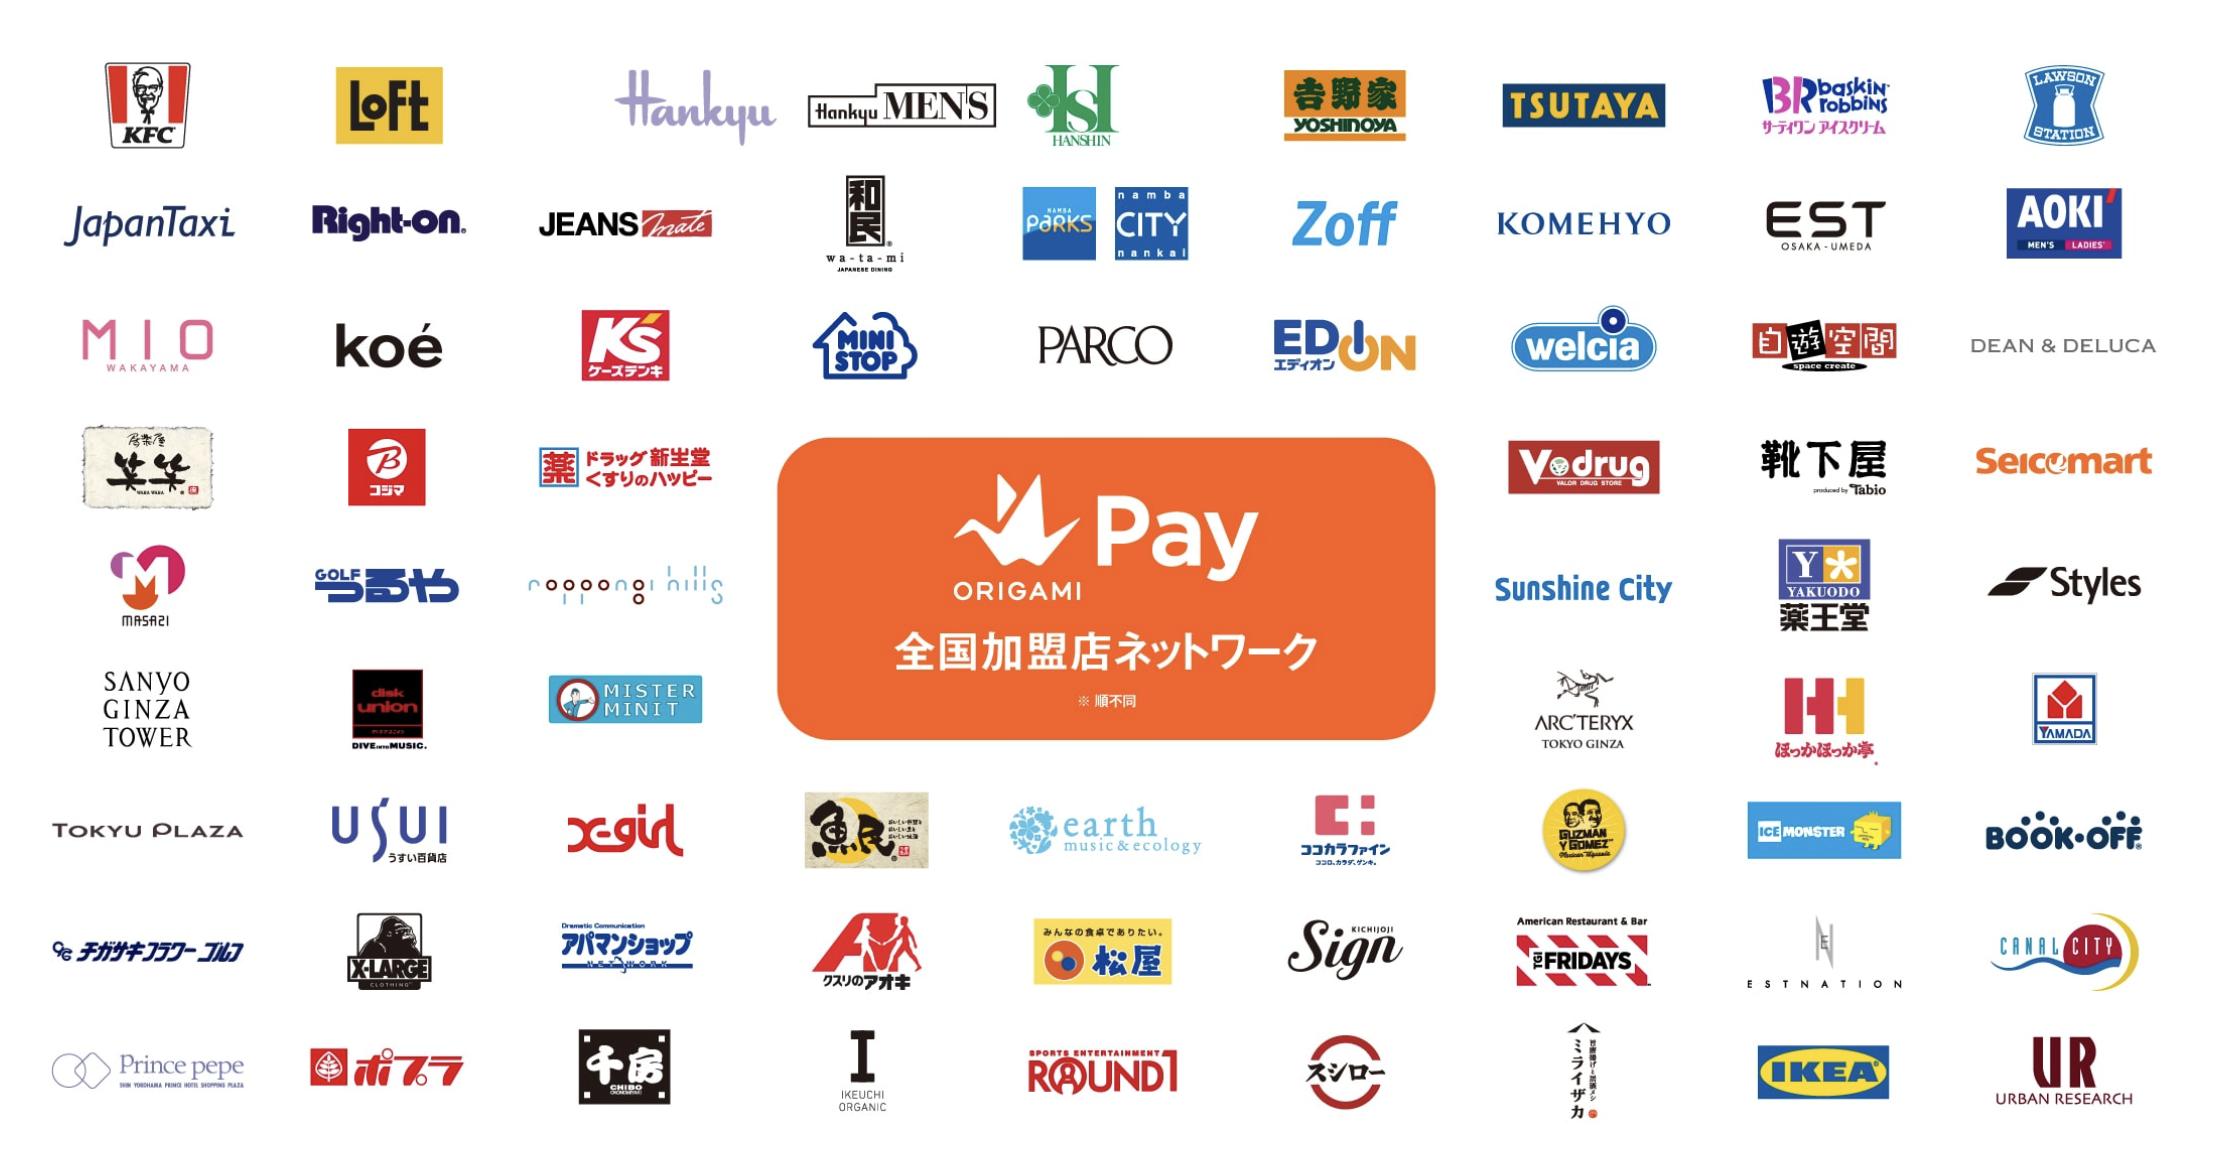 Origami Pay(オリガミペイ)加盟店